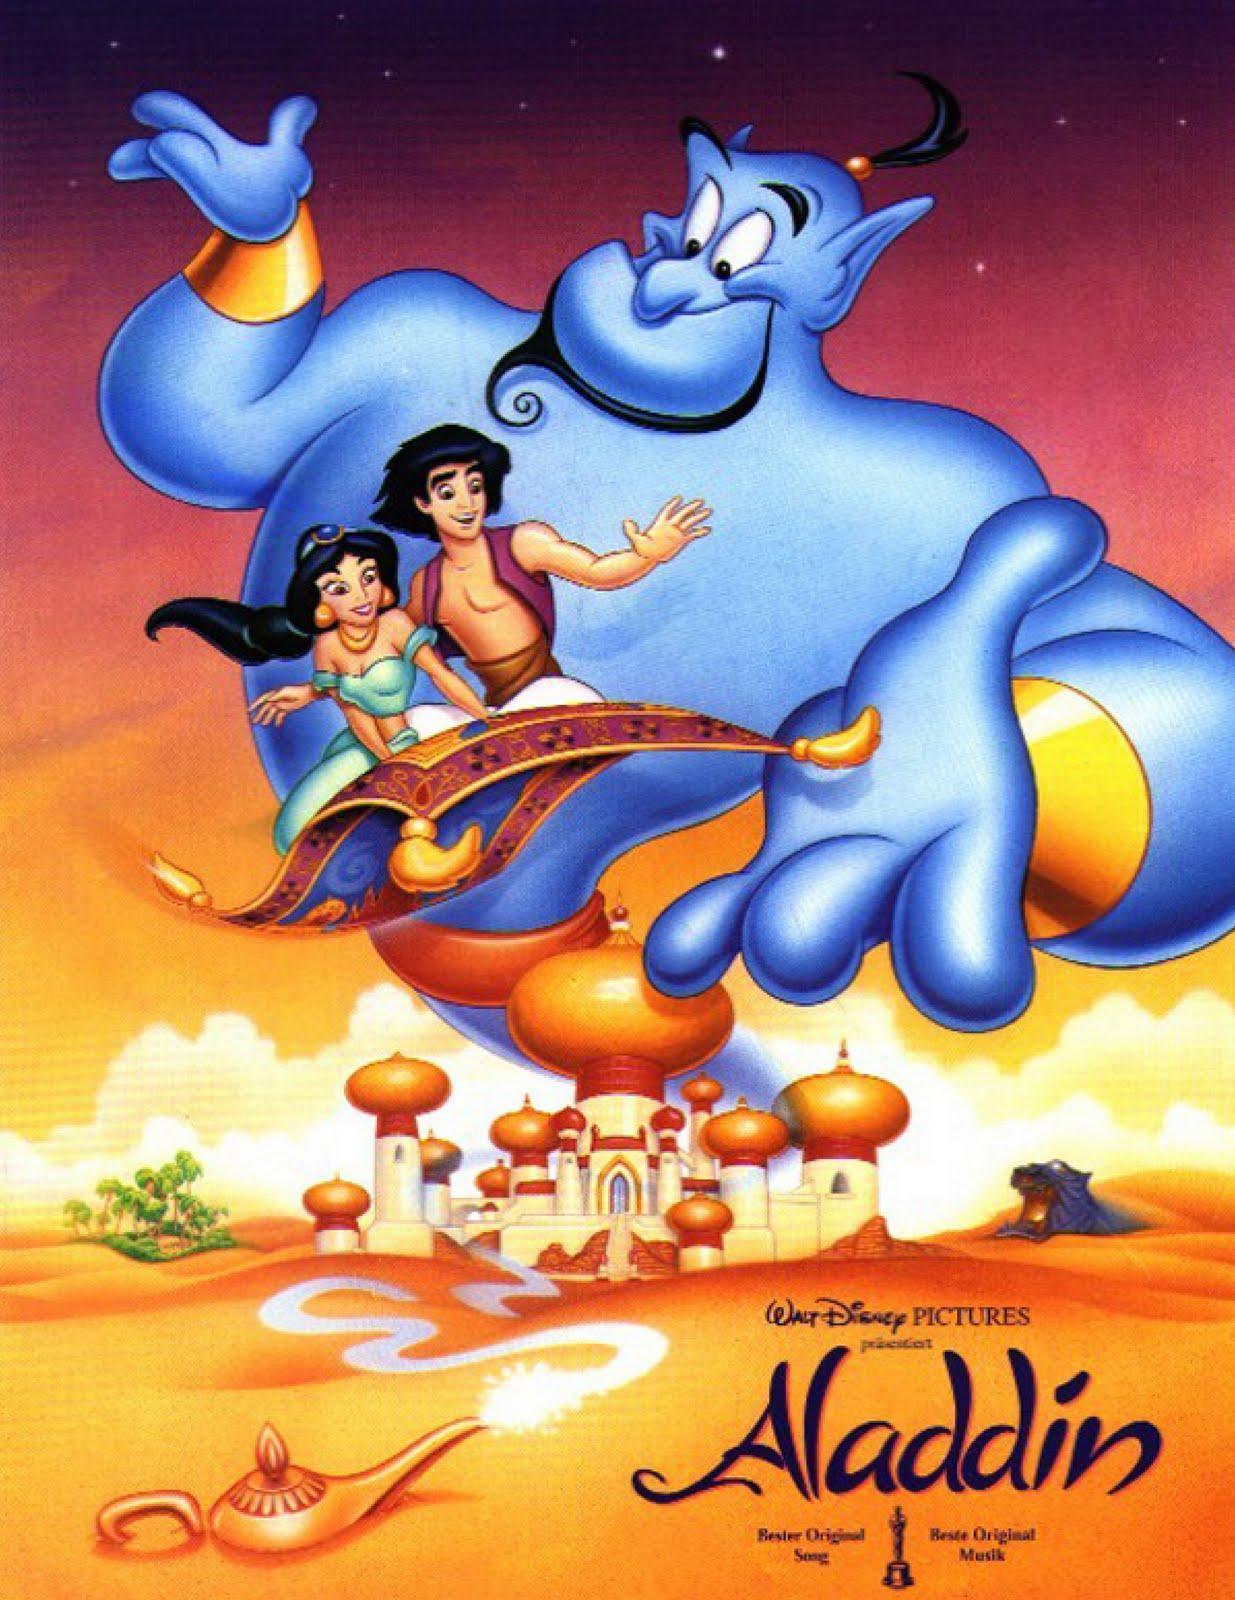 Disney Jasmine Aladdin Wallpaper For PC